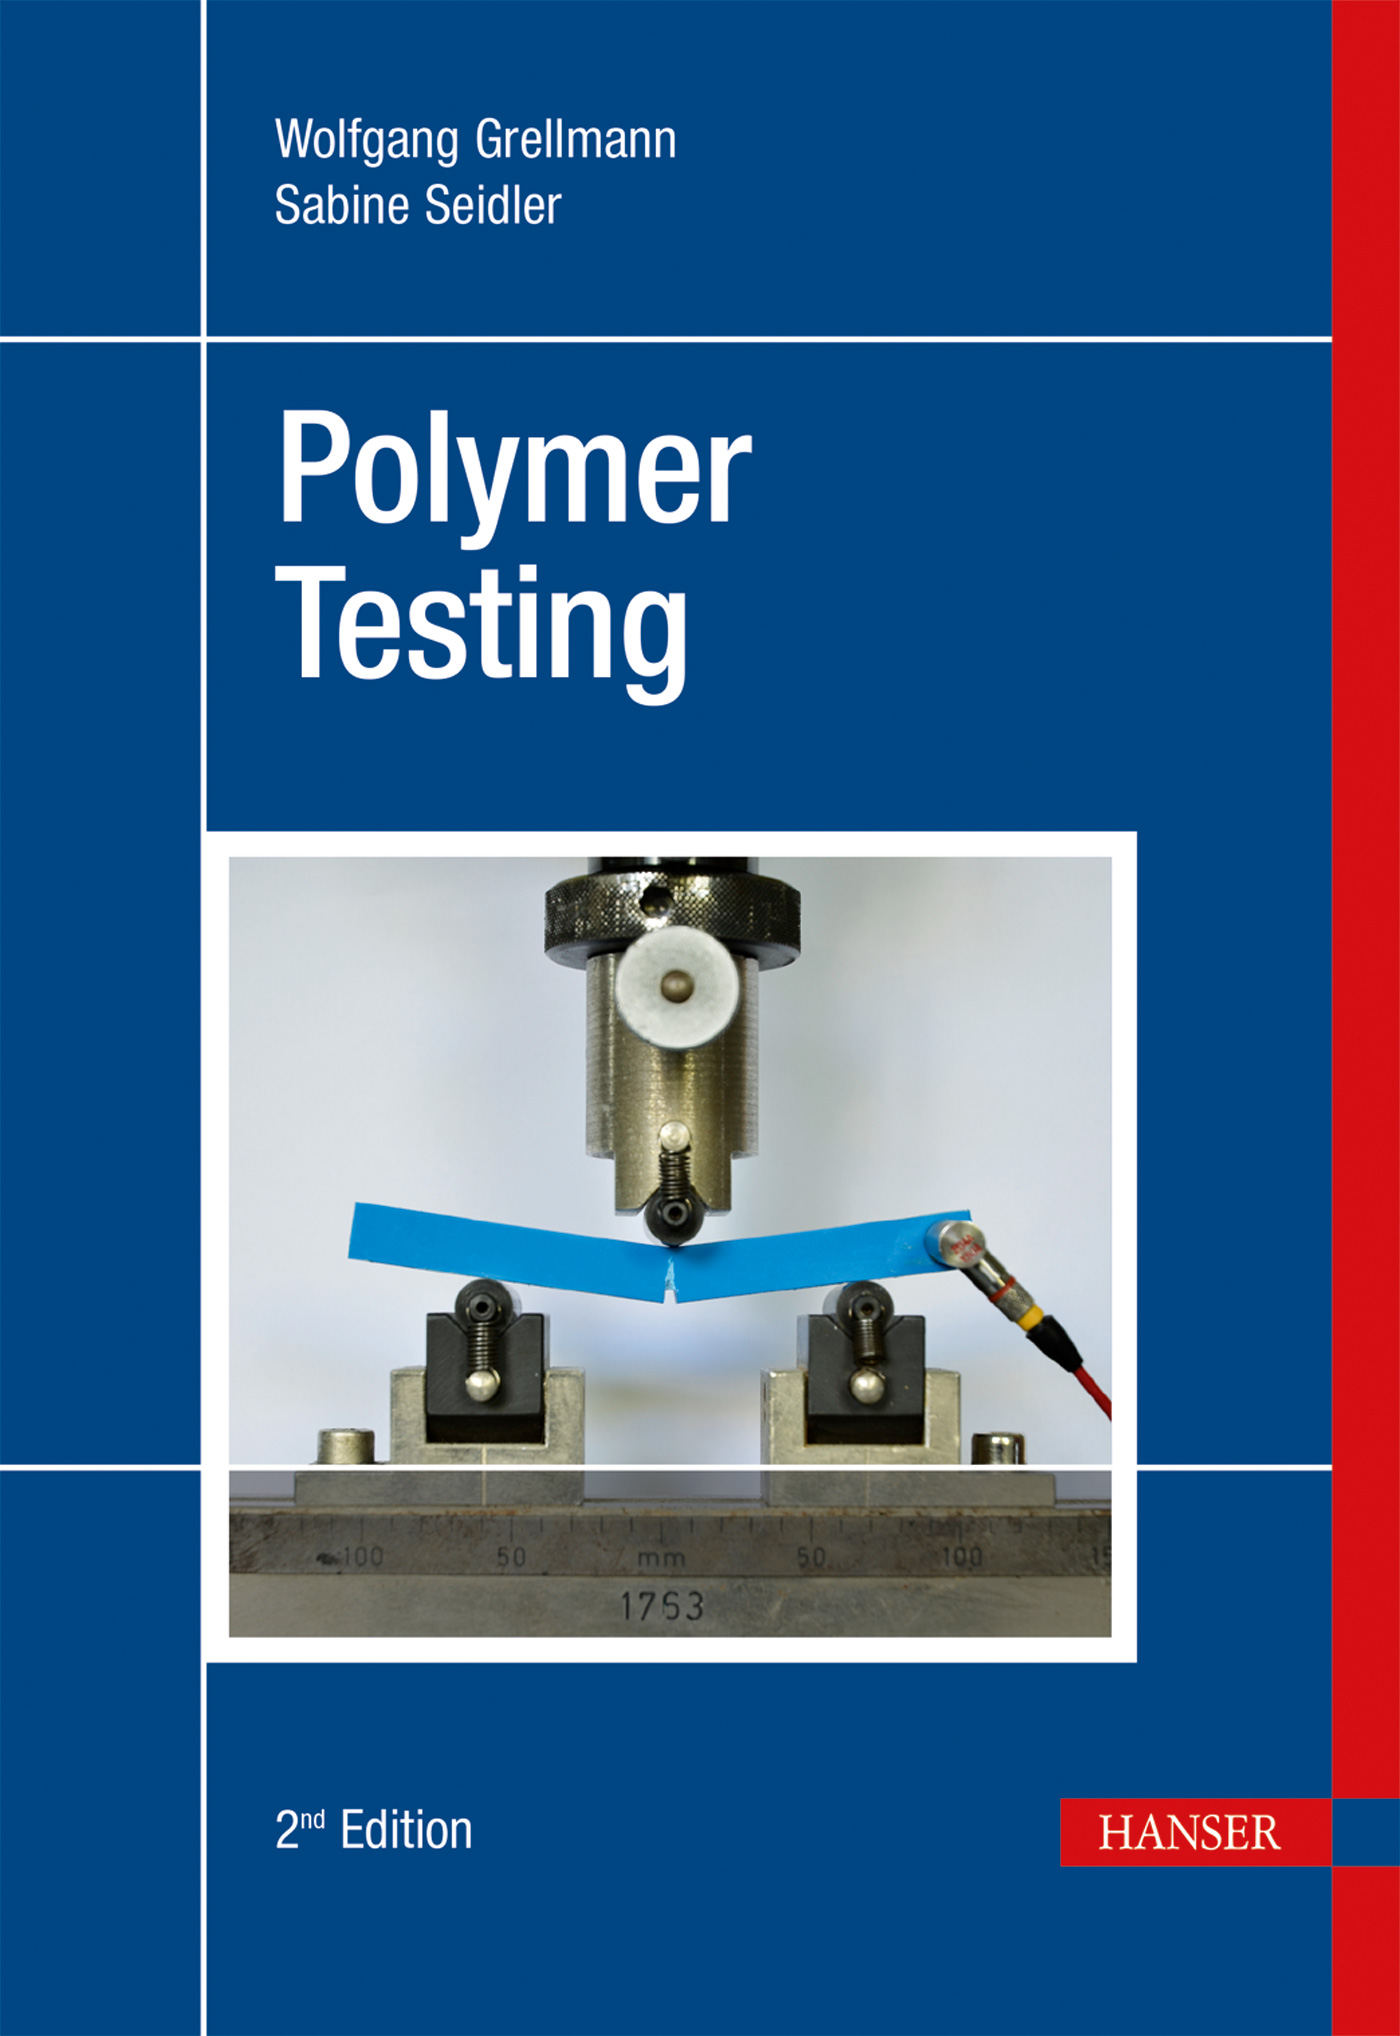 Polymer Testing, 978-1-56990-548-7